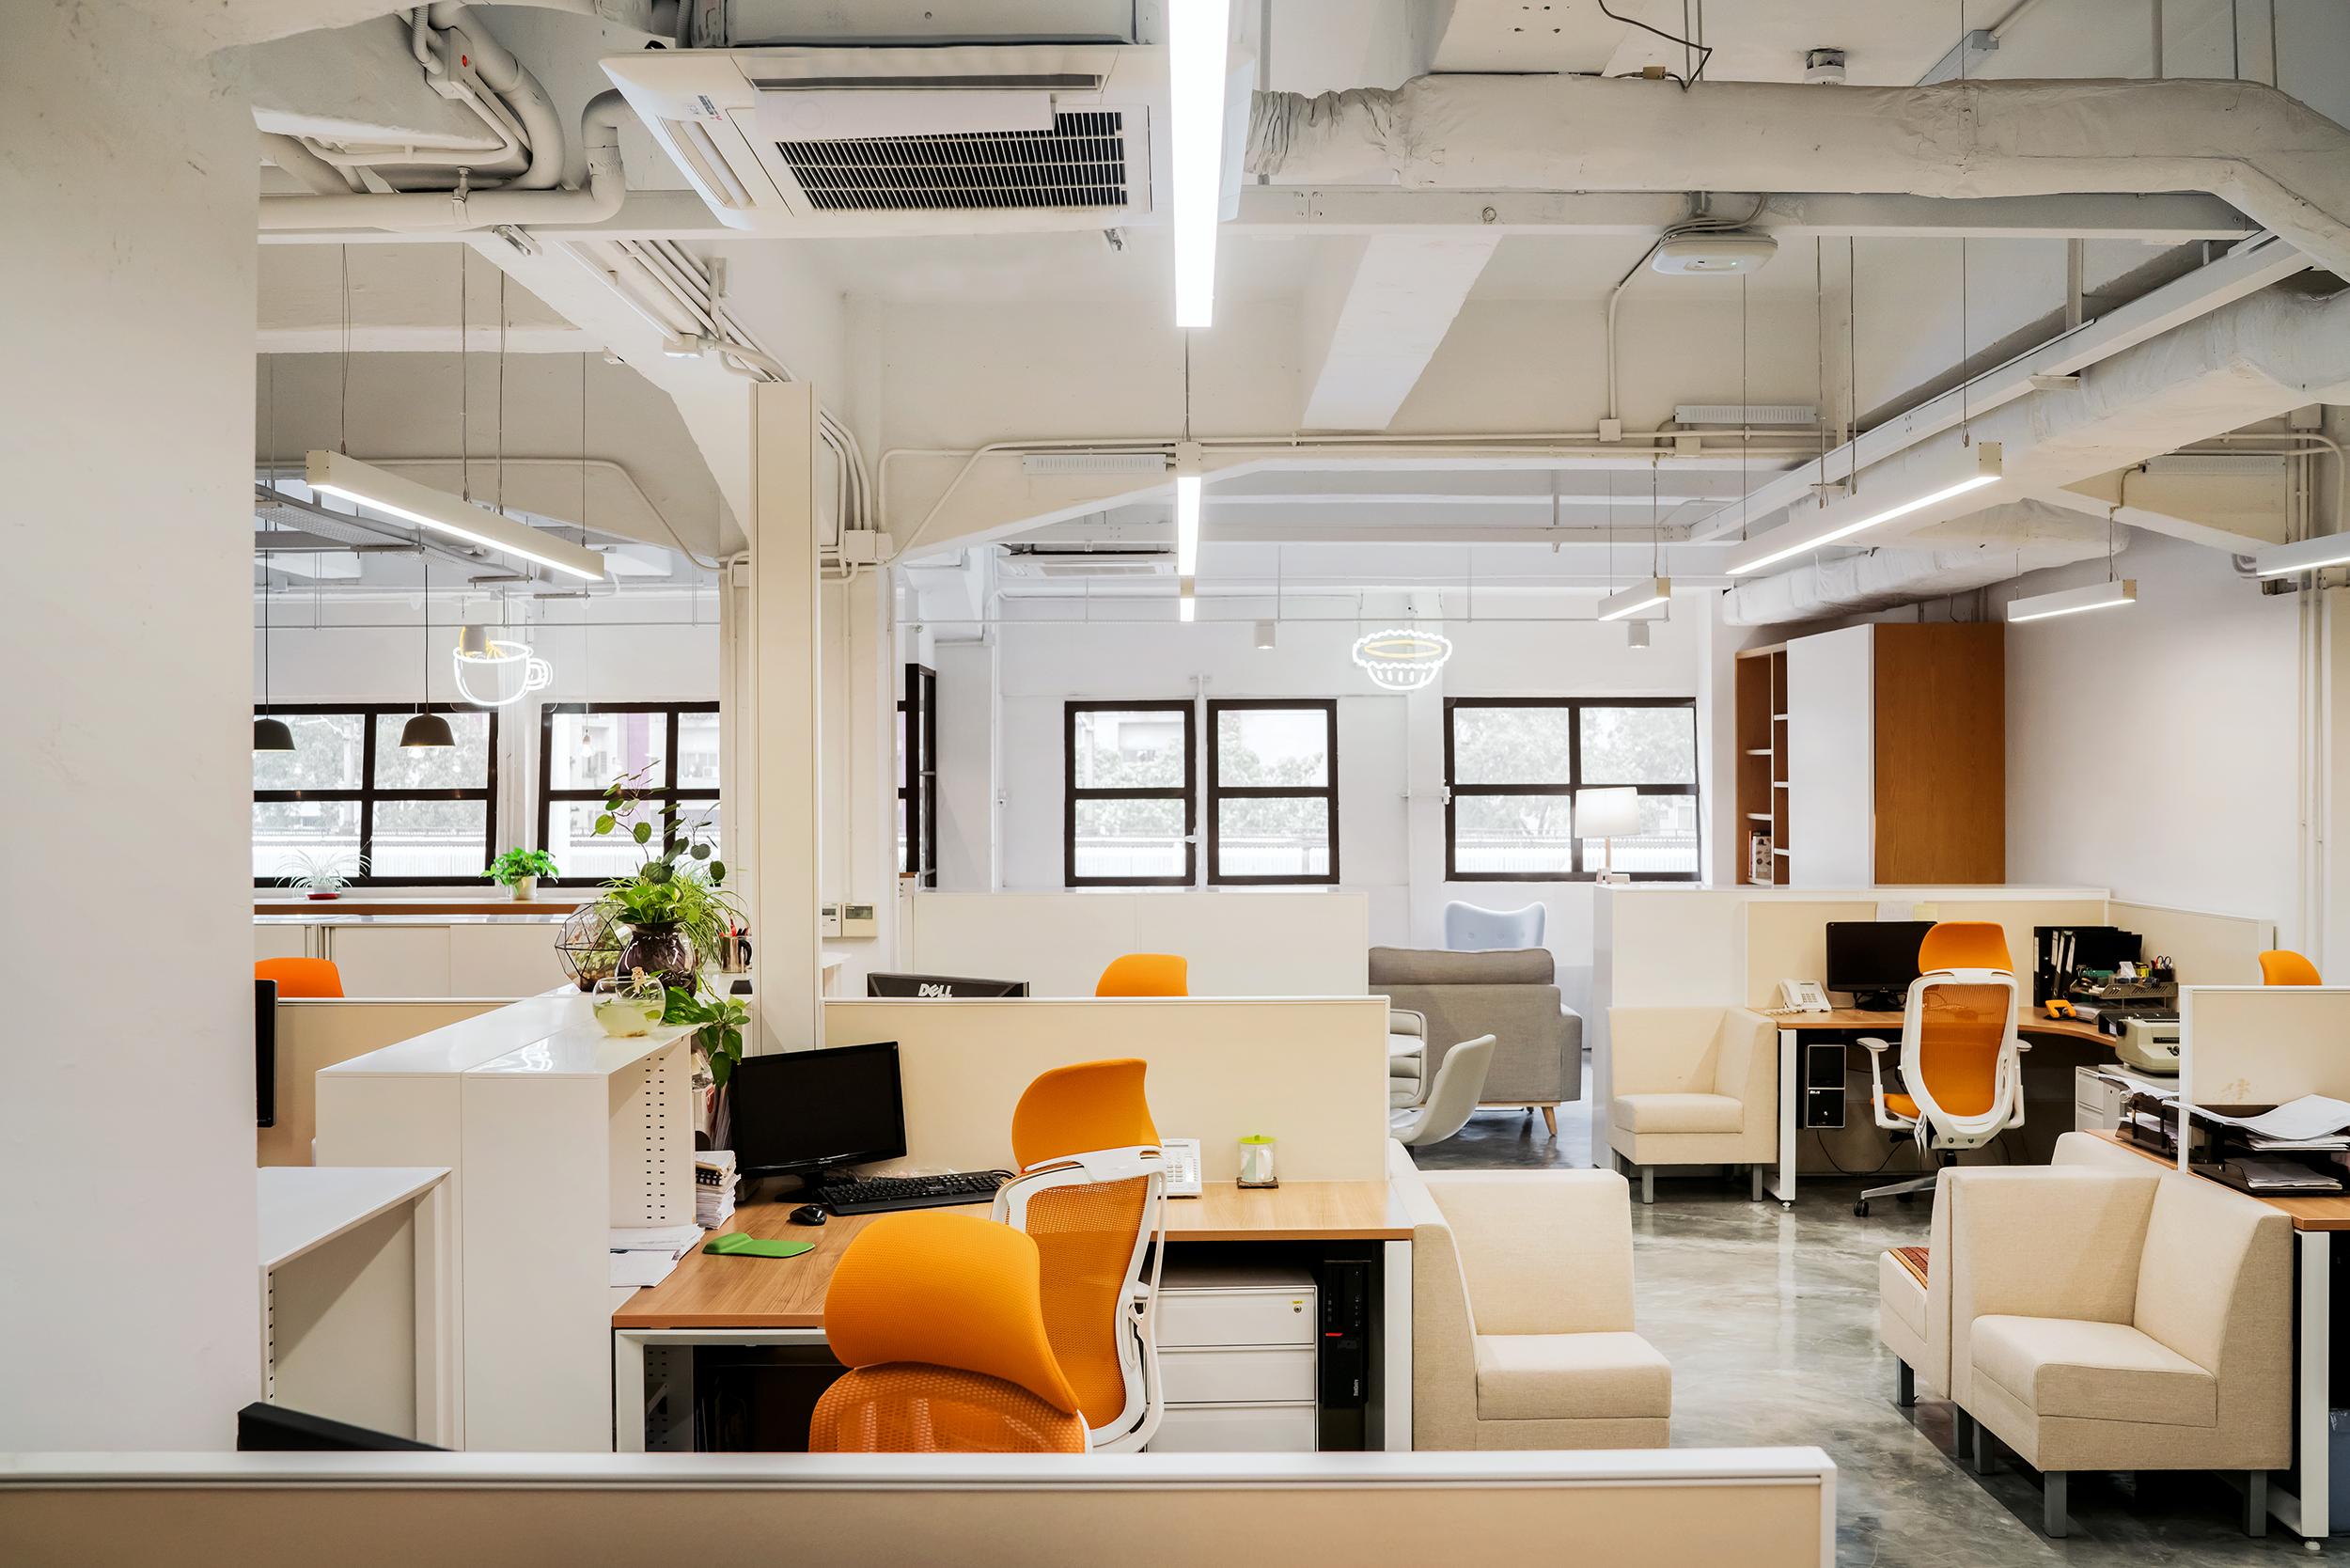 HK-Meyer-Office-2799_web.jpg